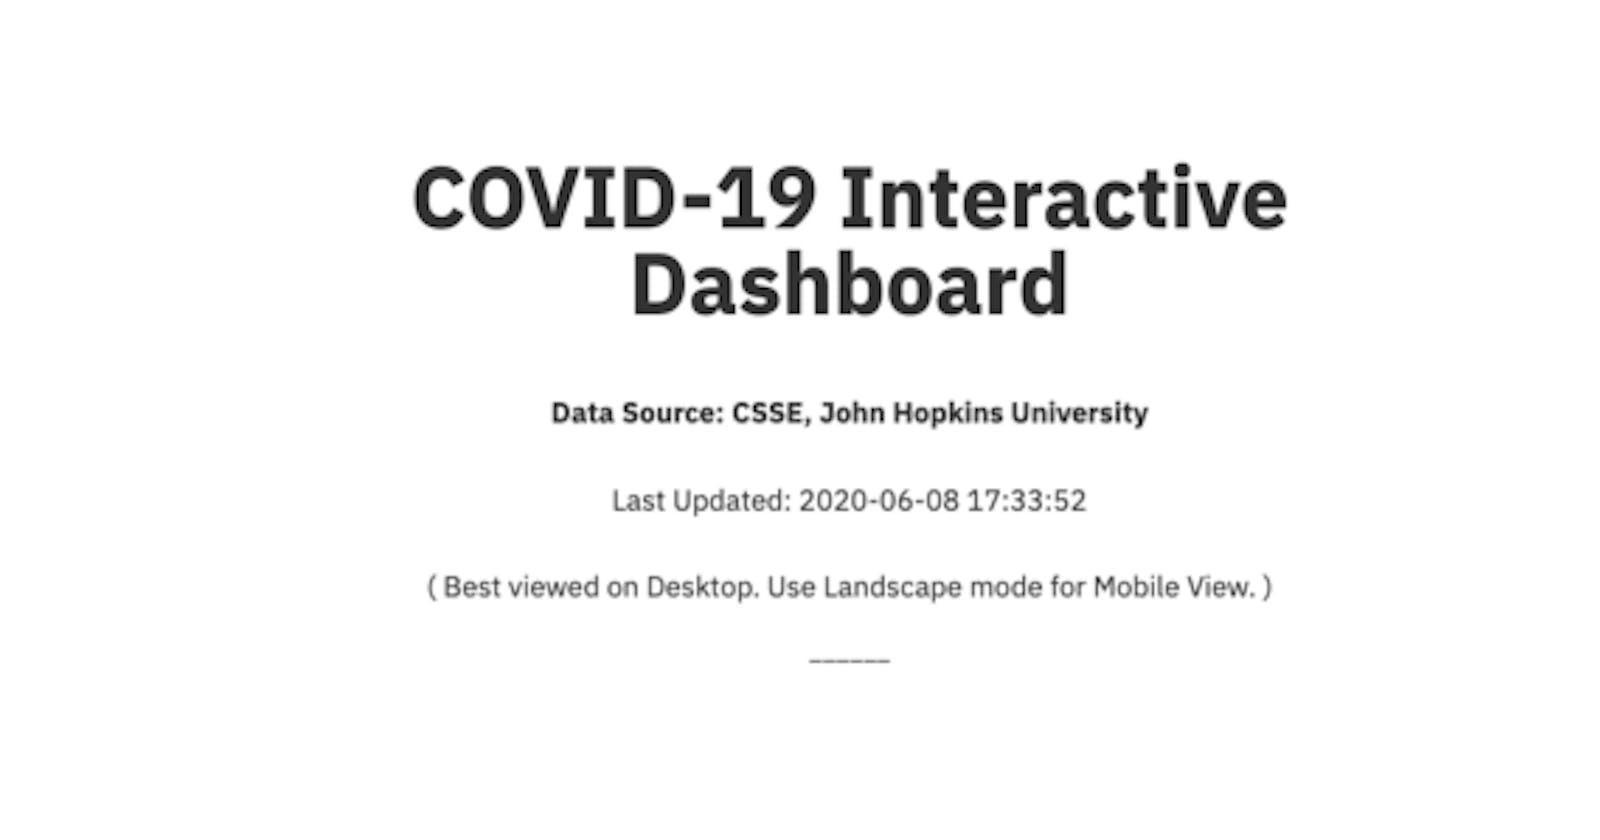 COVID-19 Dashboard in Python using Streamlit